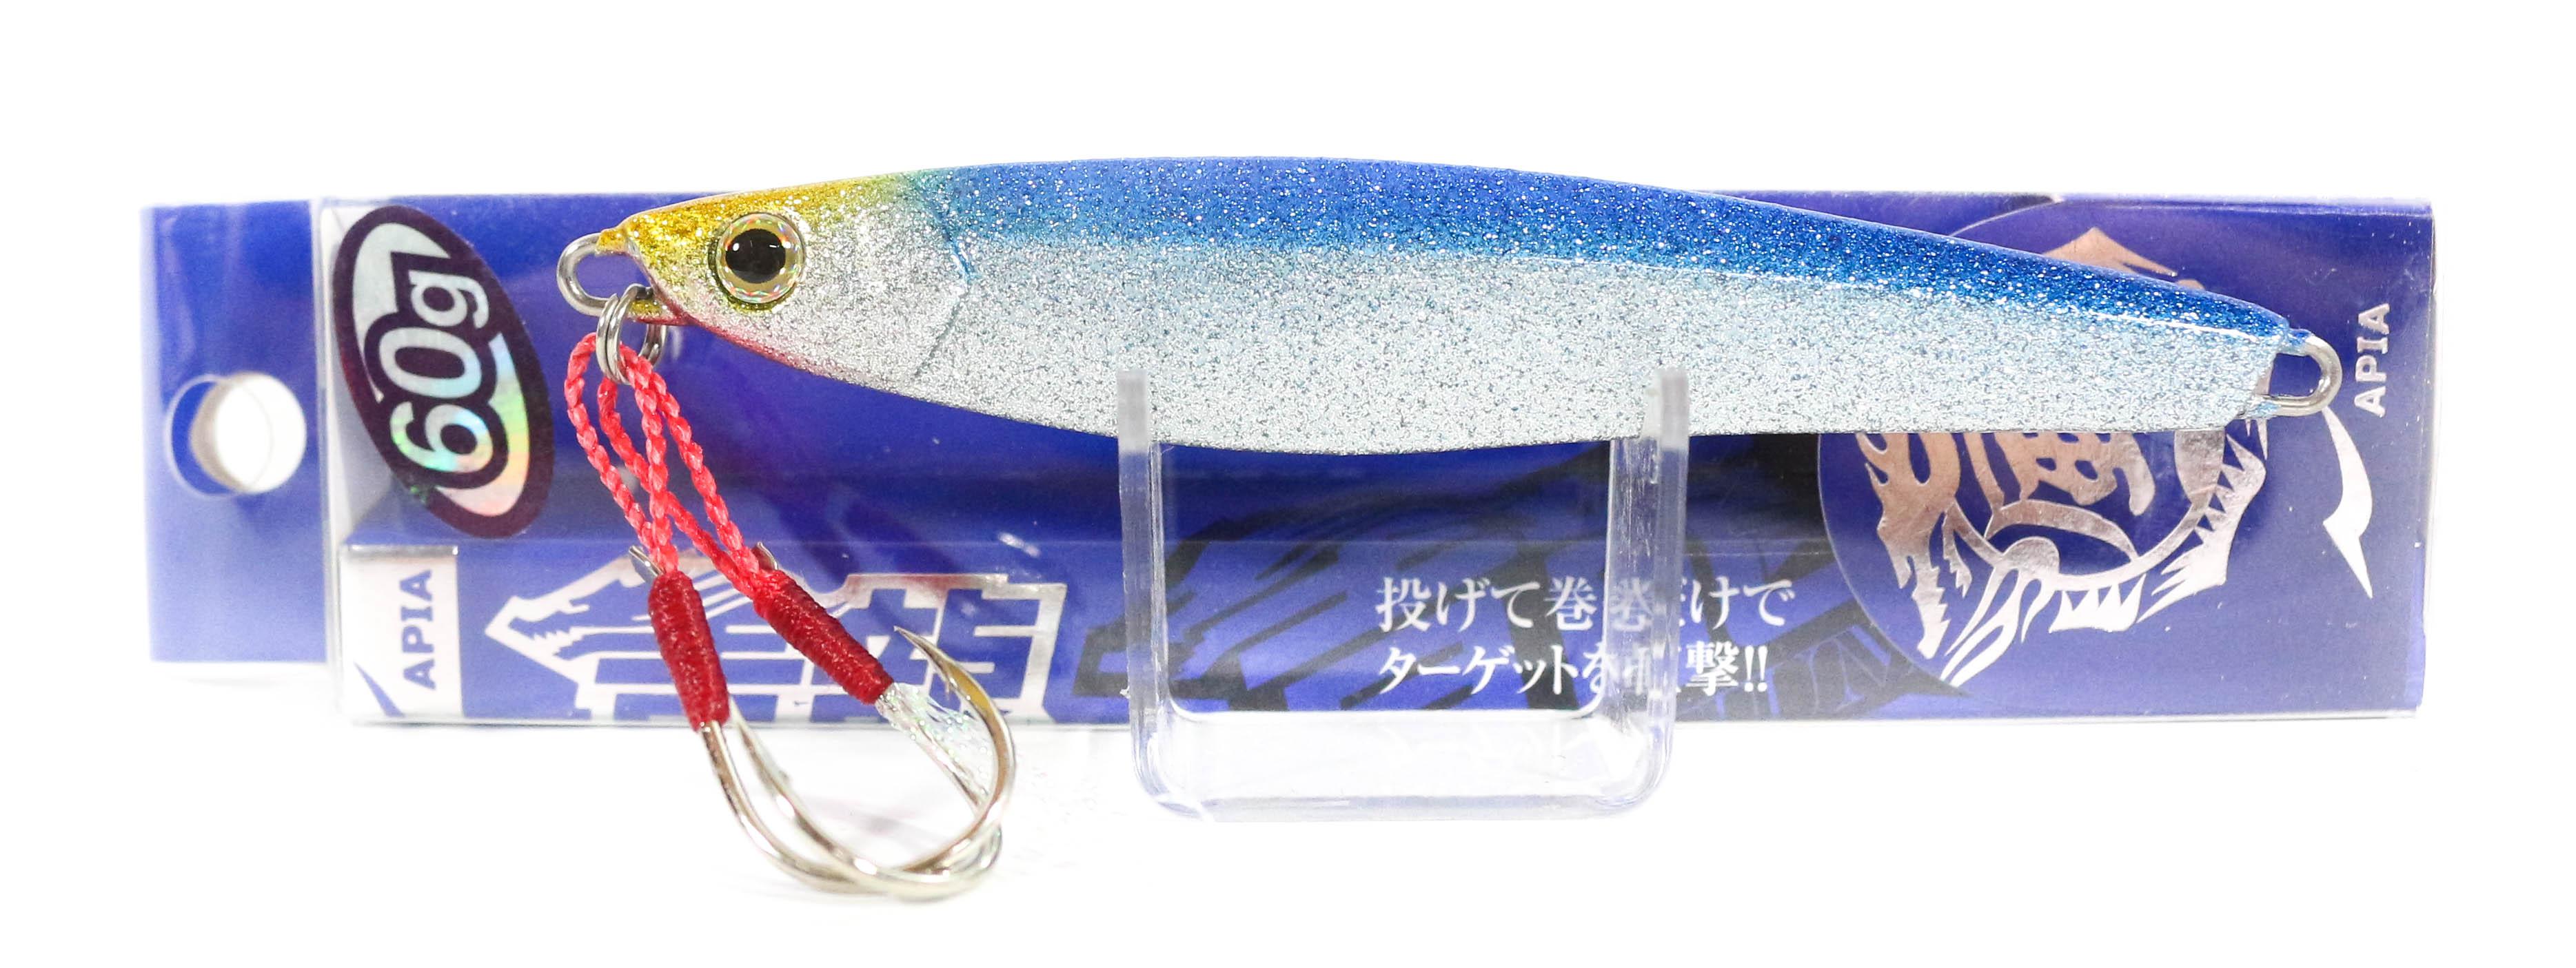 Sale Apia Metal Jig Seiryu Premium 60 grams 42 (8672)